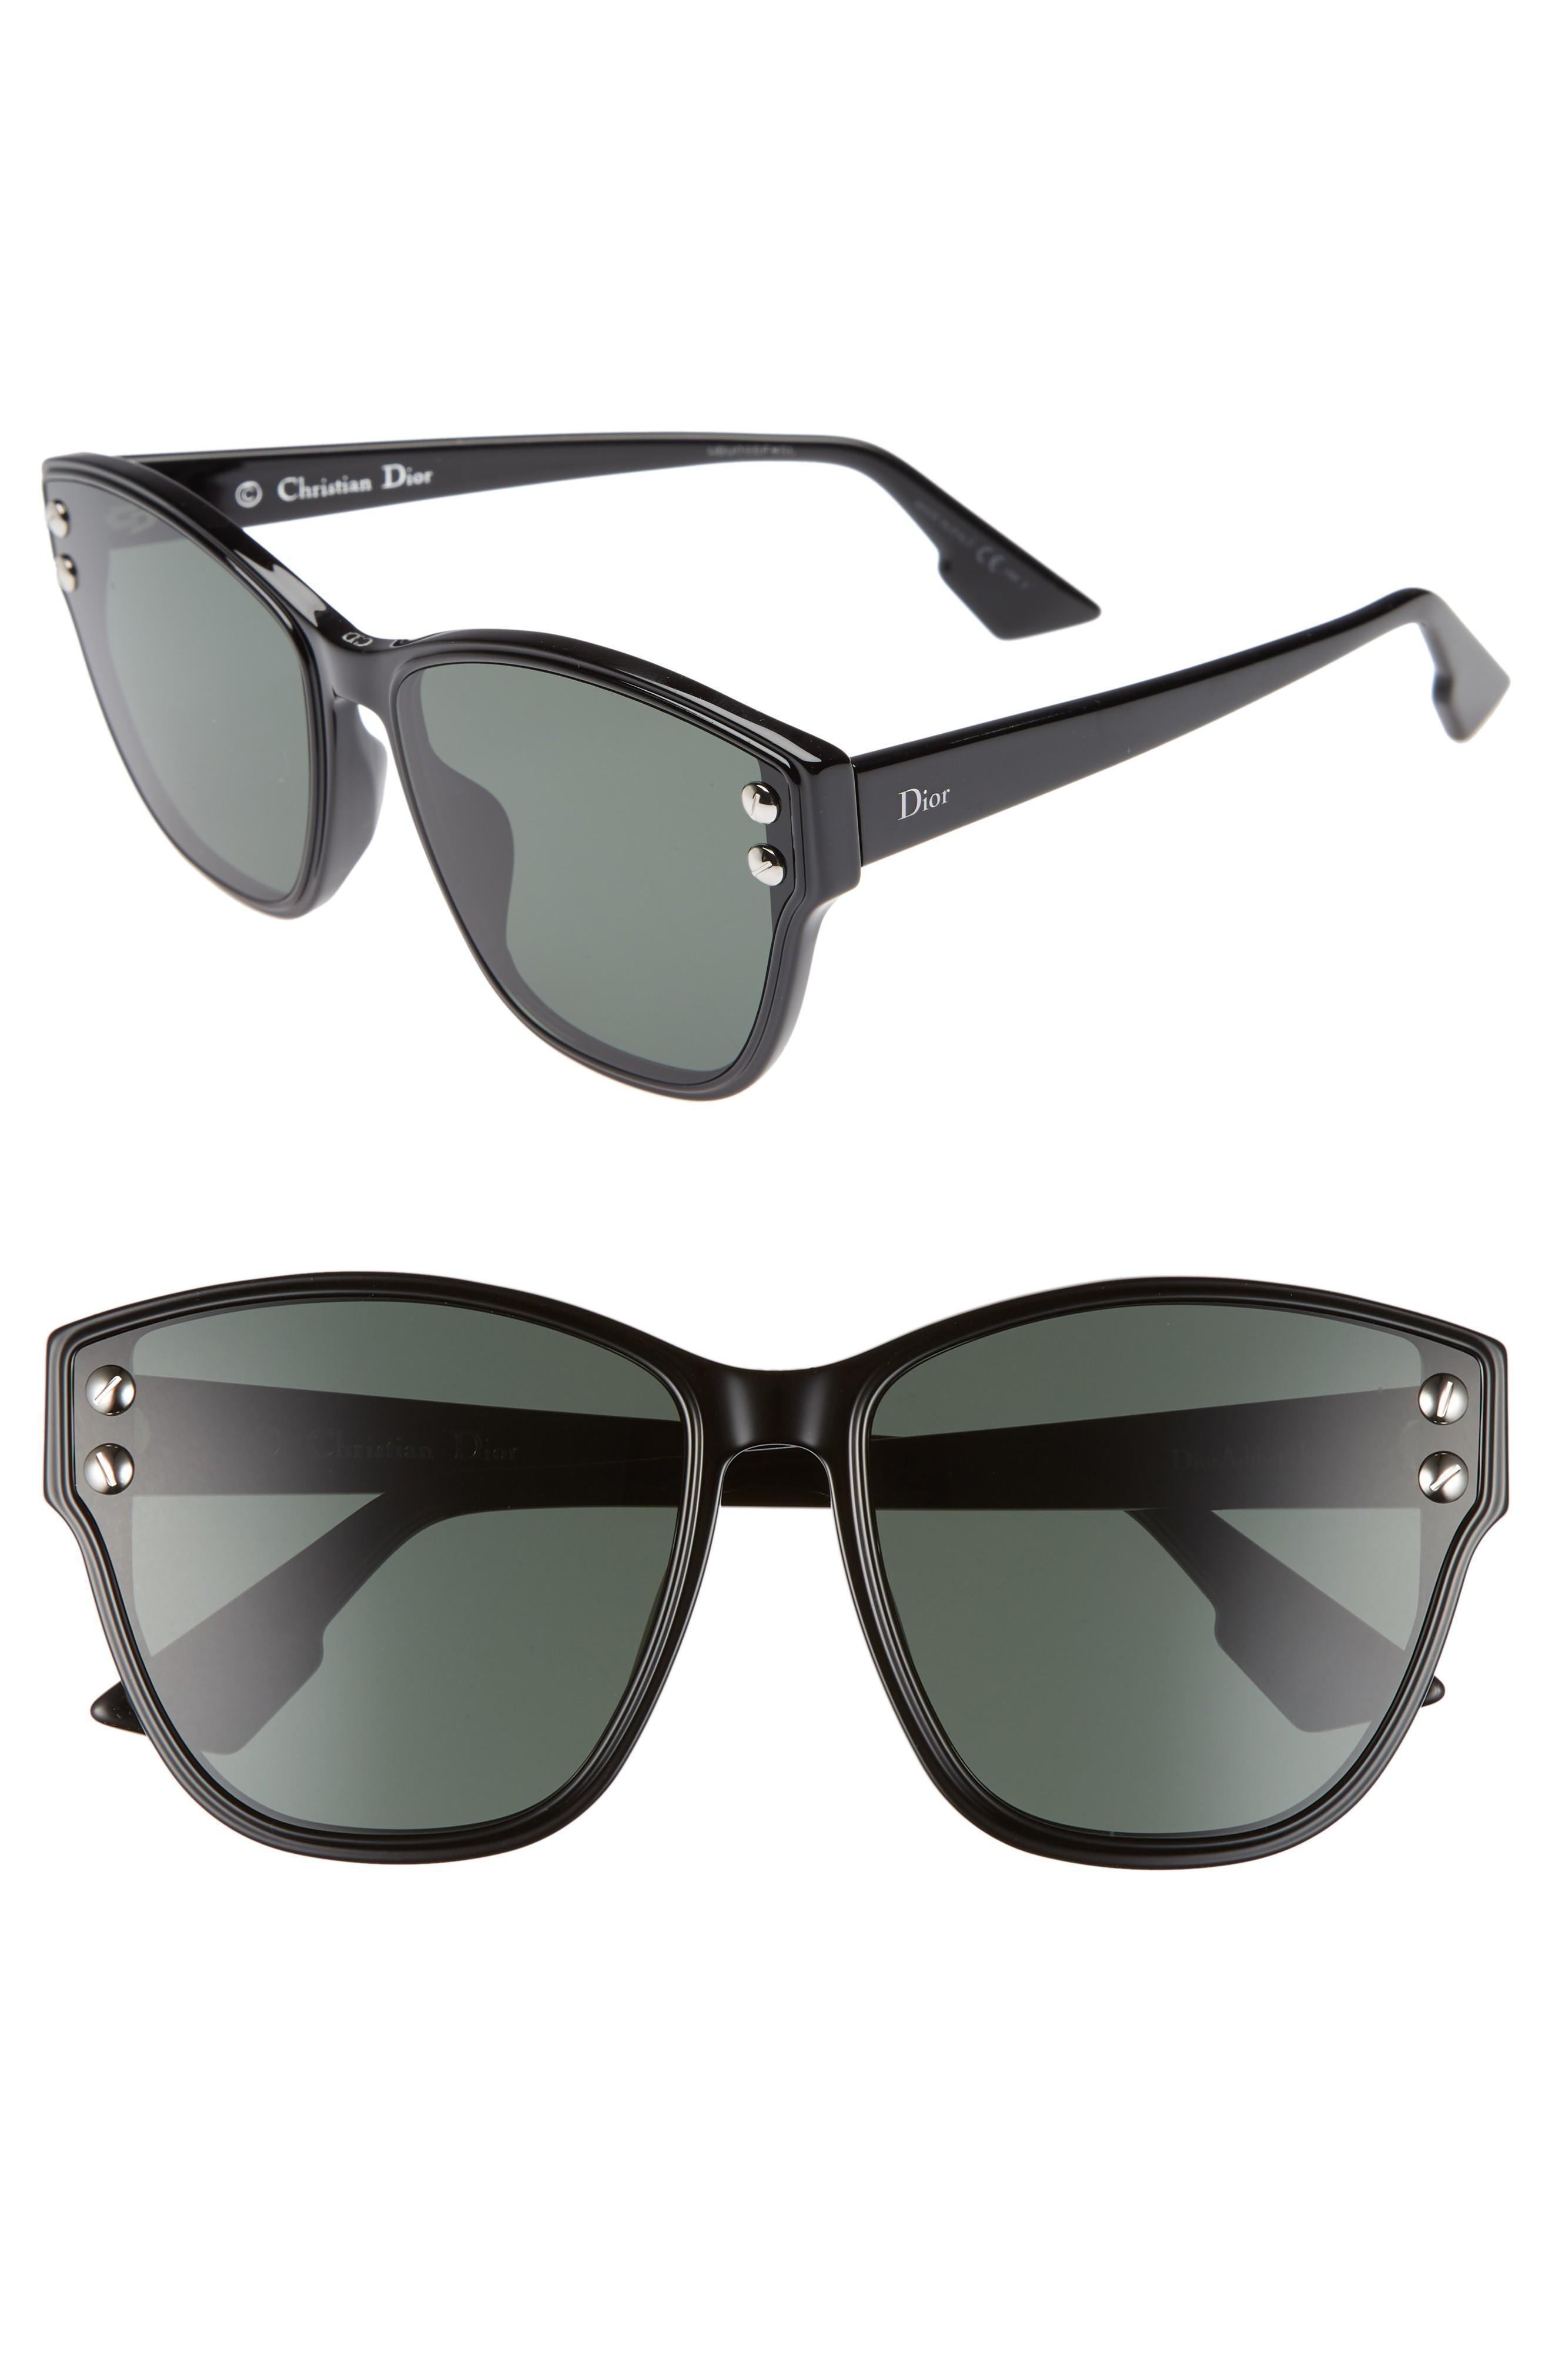 8457723043aa Dior Addict 62Mm Special Fit Cat Eye Sunglasses - Black